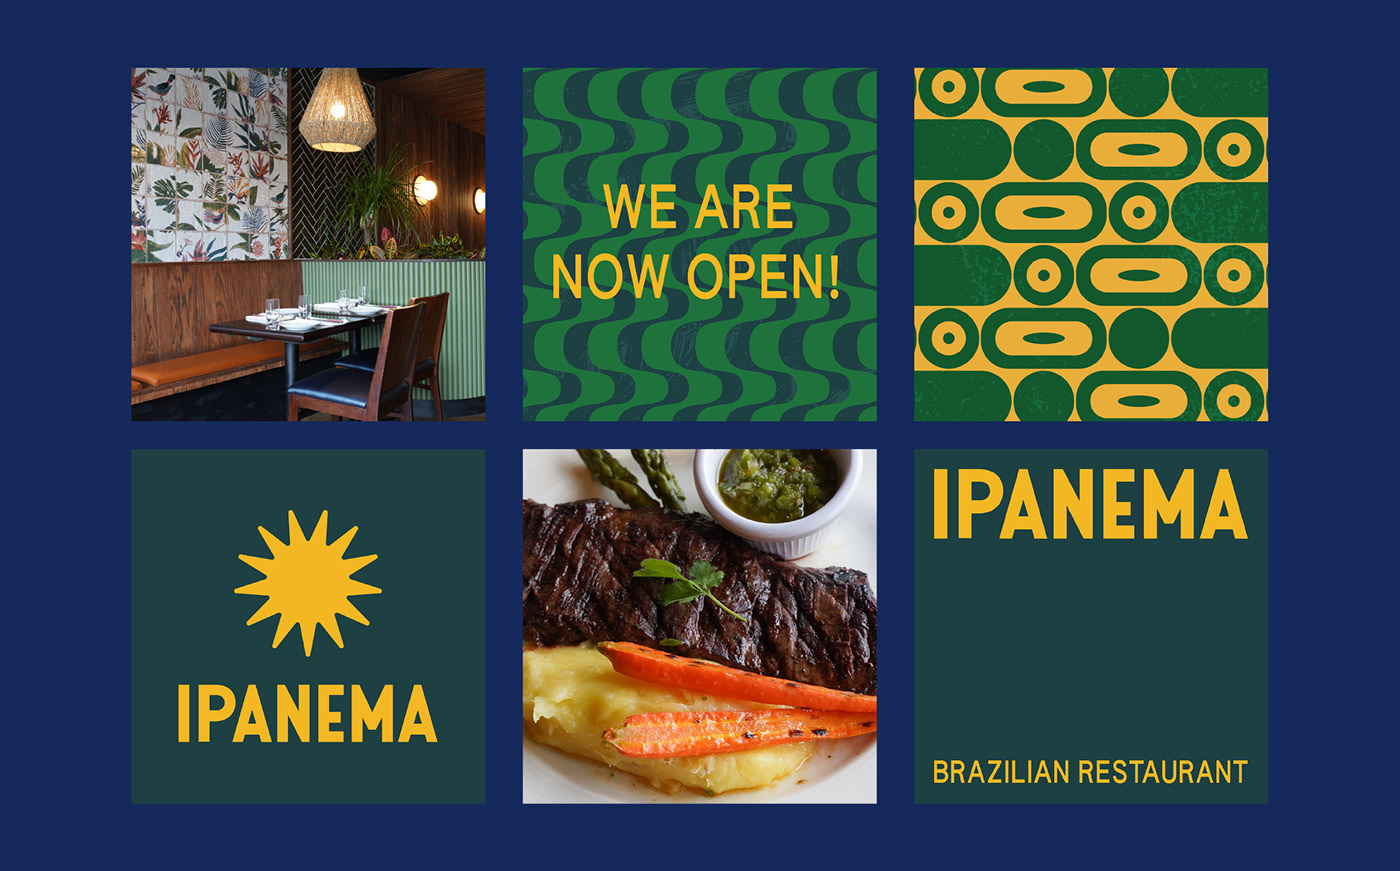 beach branding  Brazil Food  ILLUSTRATION  ipanema Packaging pattern restaurant south american